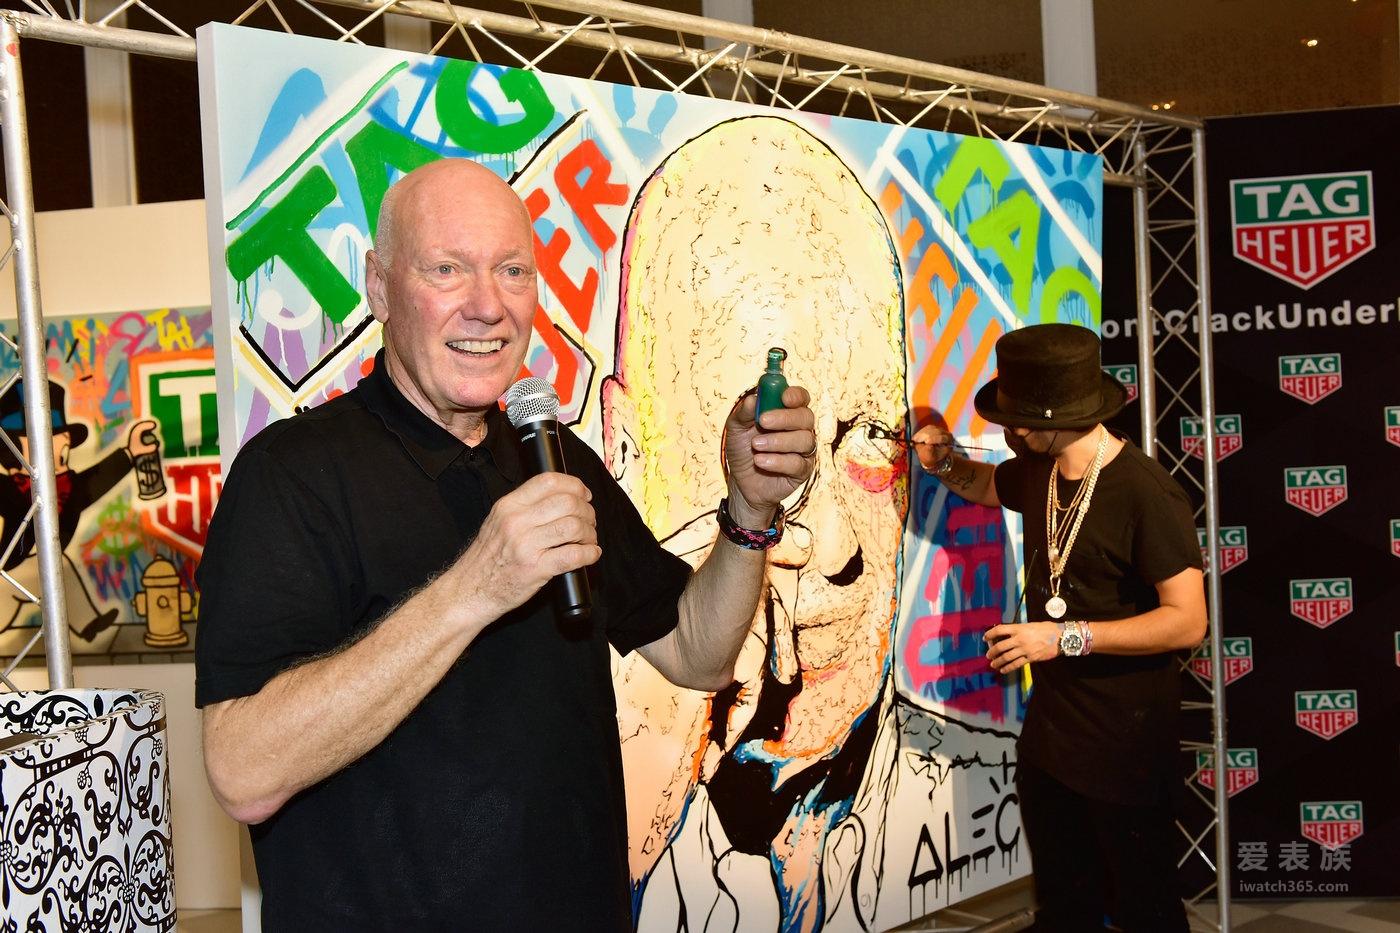 Alec Monopoly成为TAG Heuer泰格豪雅先锋艺术家!